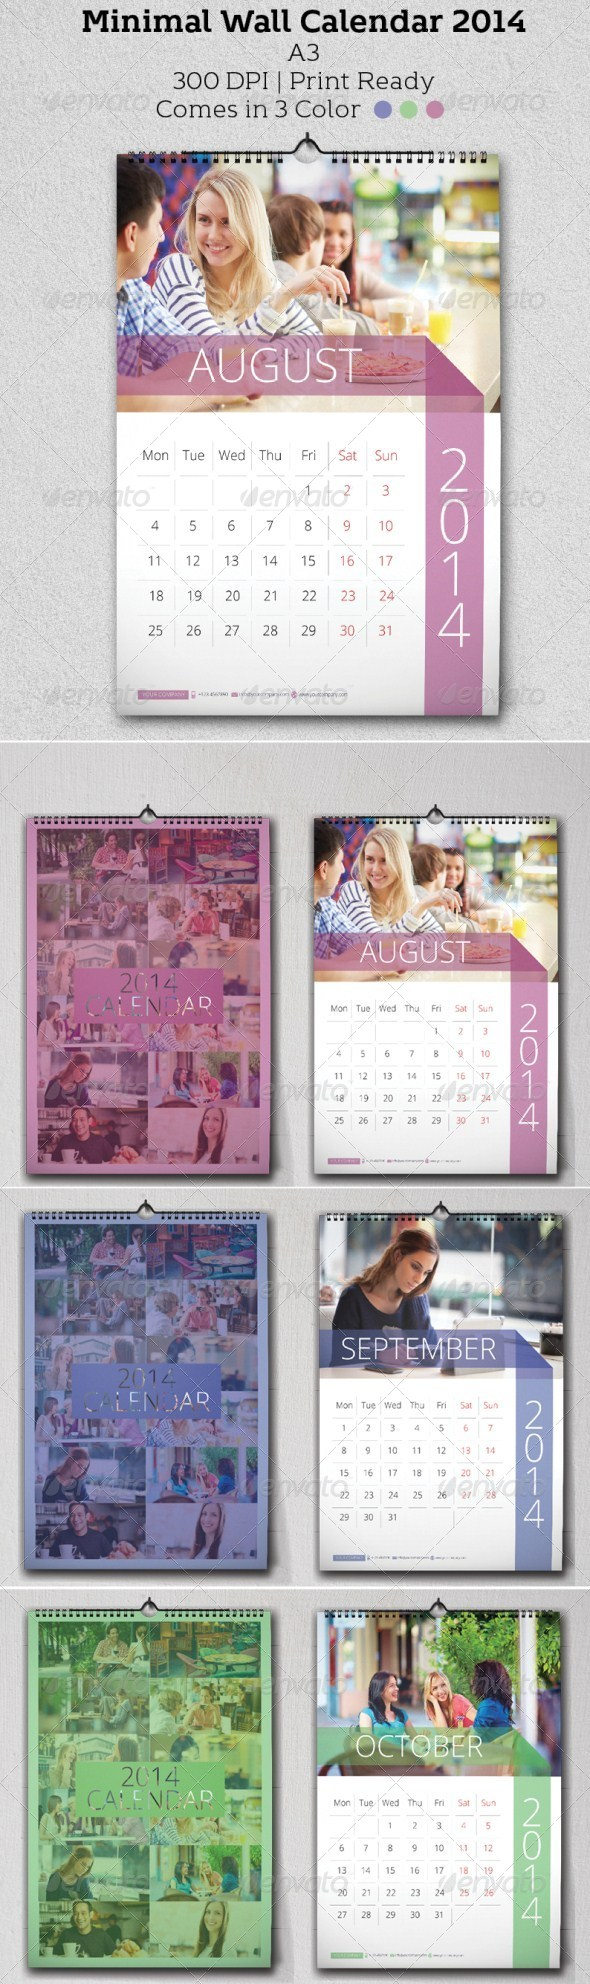 GraphicRiver Minimal Wall Calendar 2014 6204233